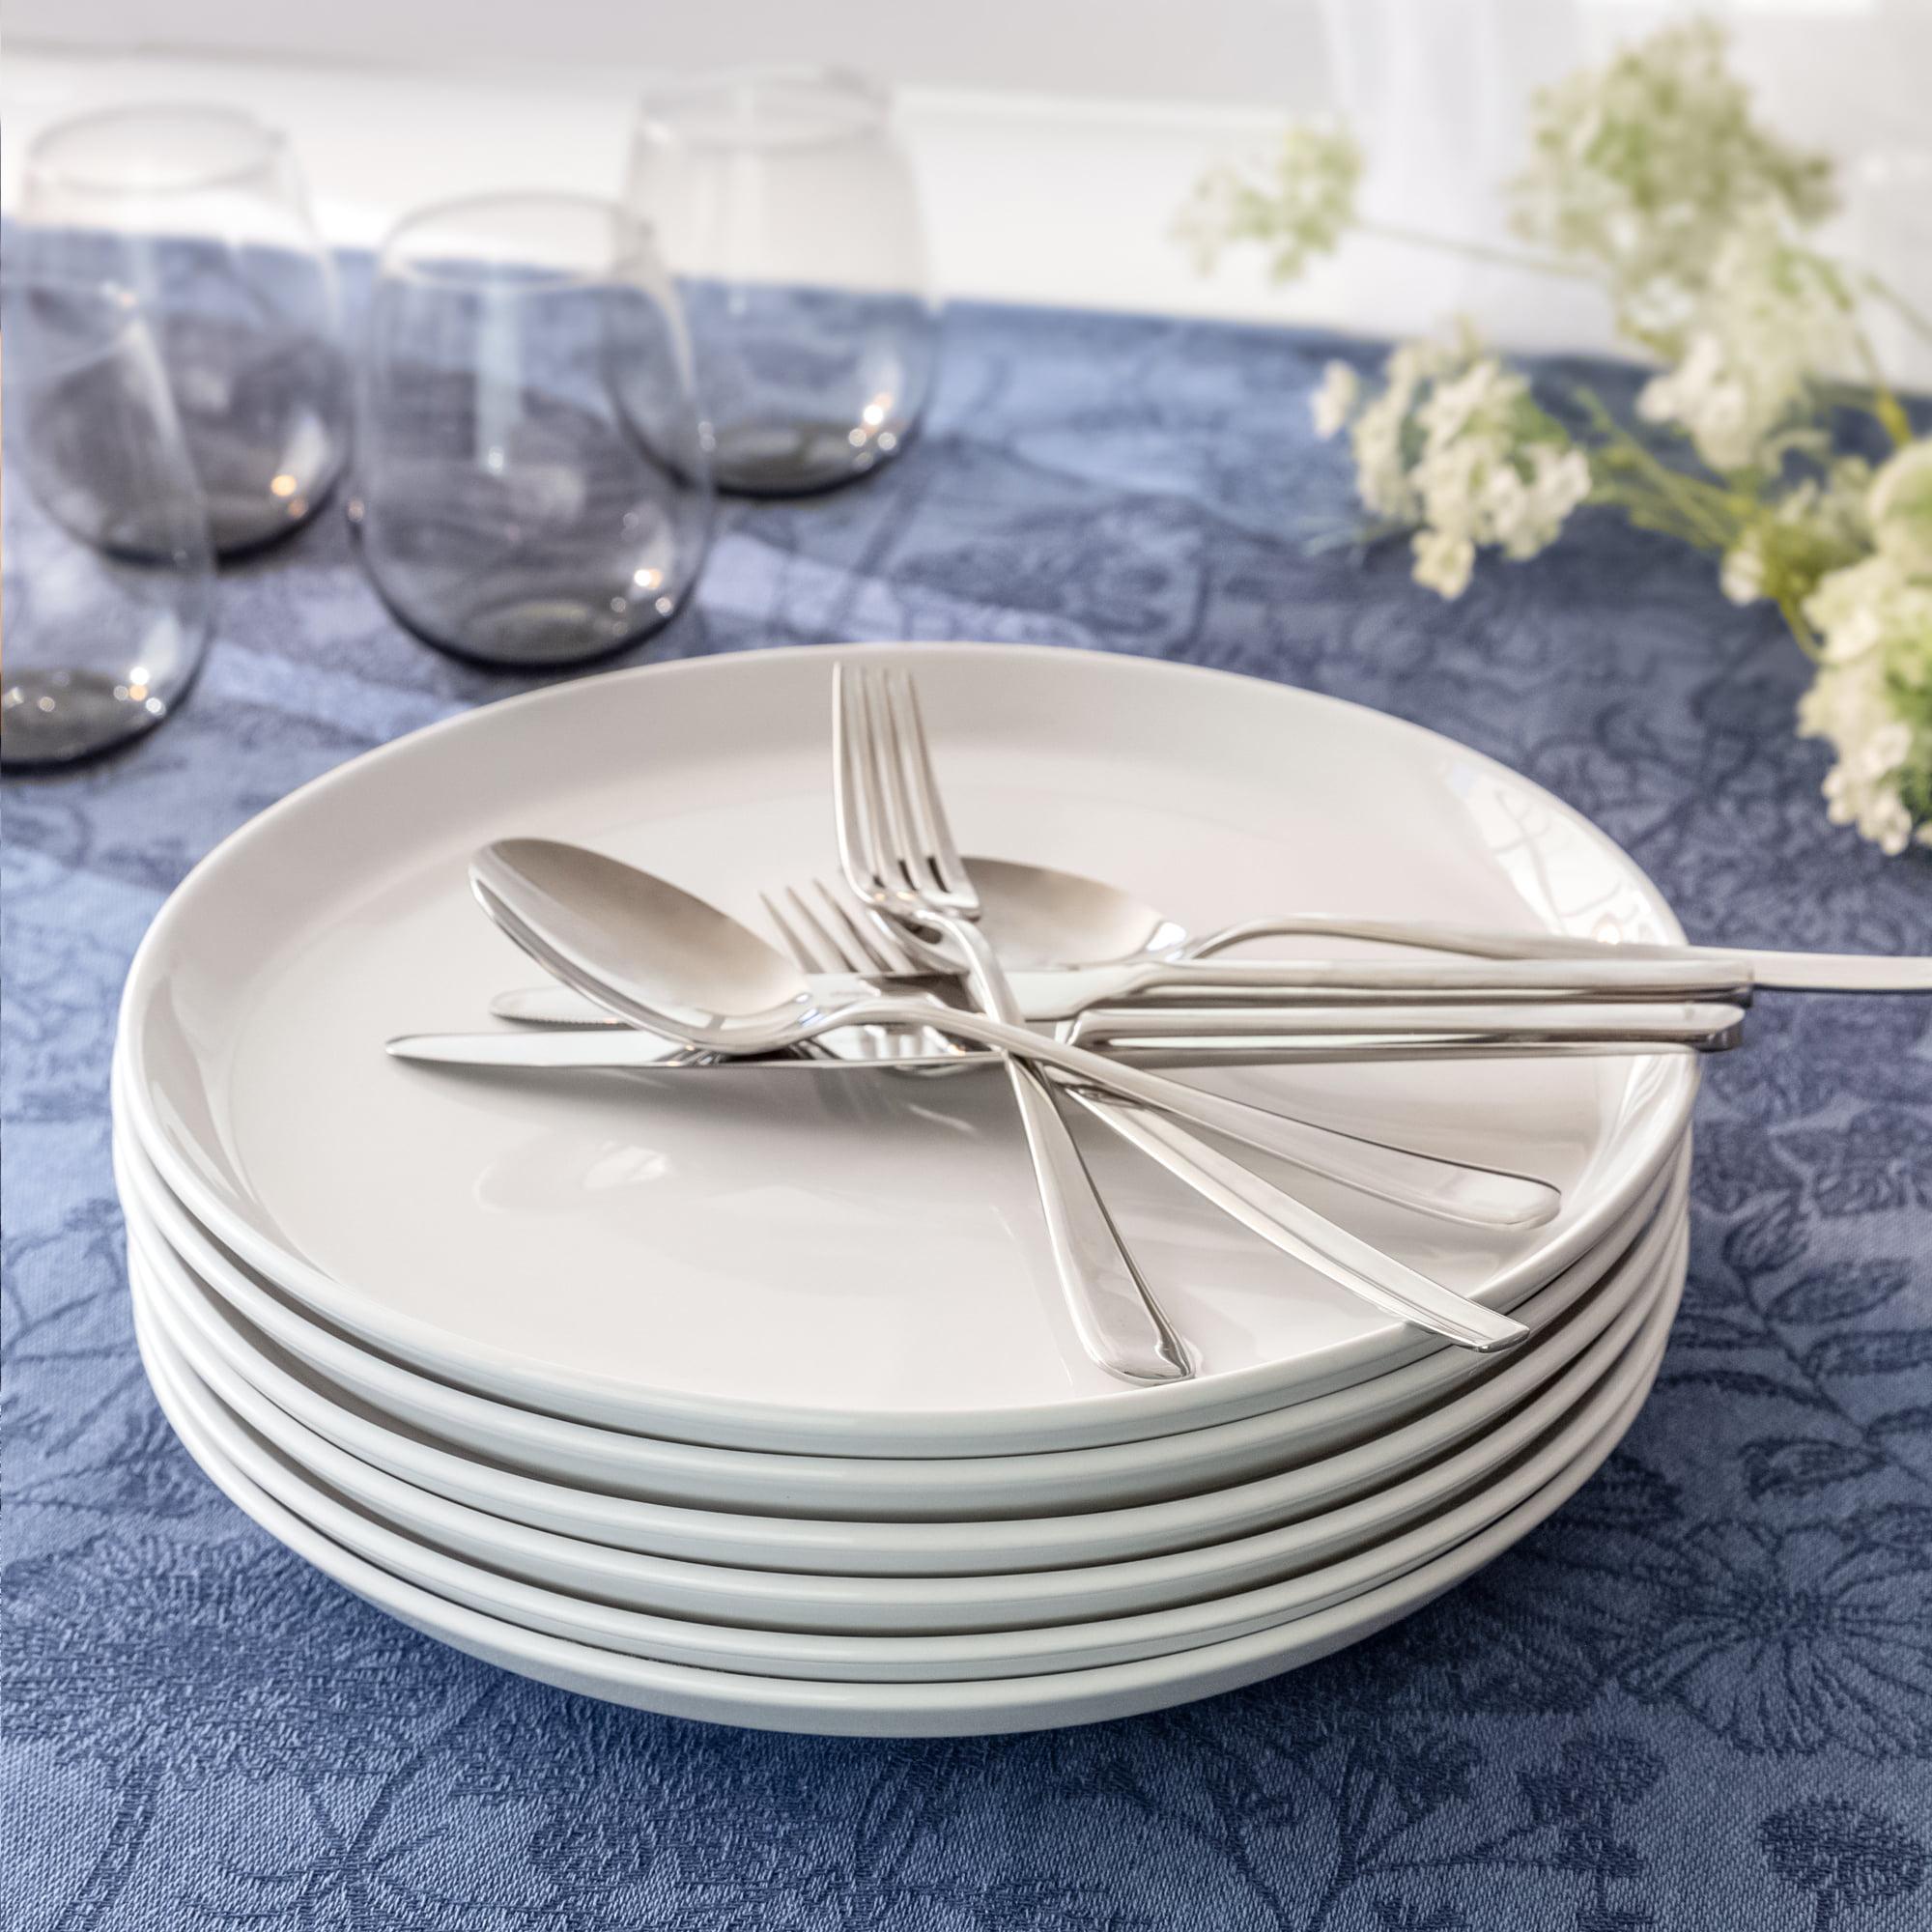 Better Homes Gardens Collins Round Porcelain Modern Dinner Plates Set Of 12 White Walmart Com Walmart Com